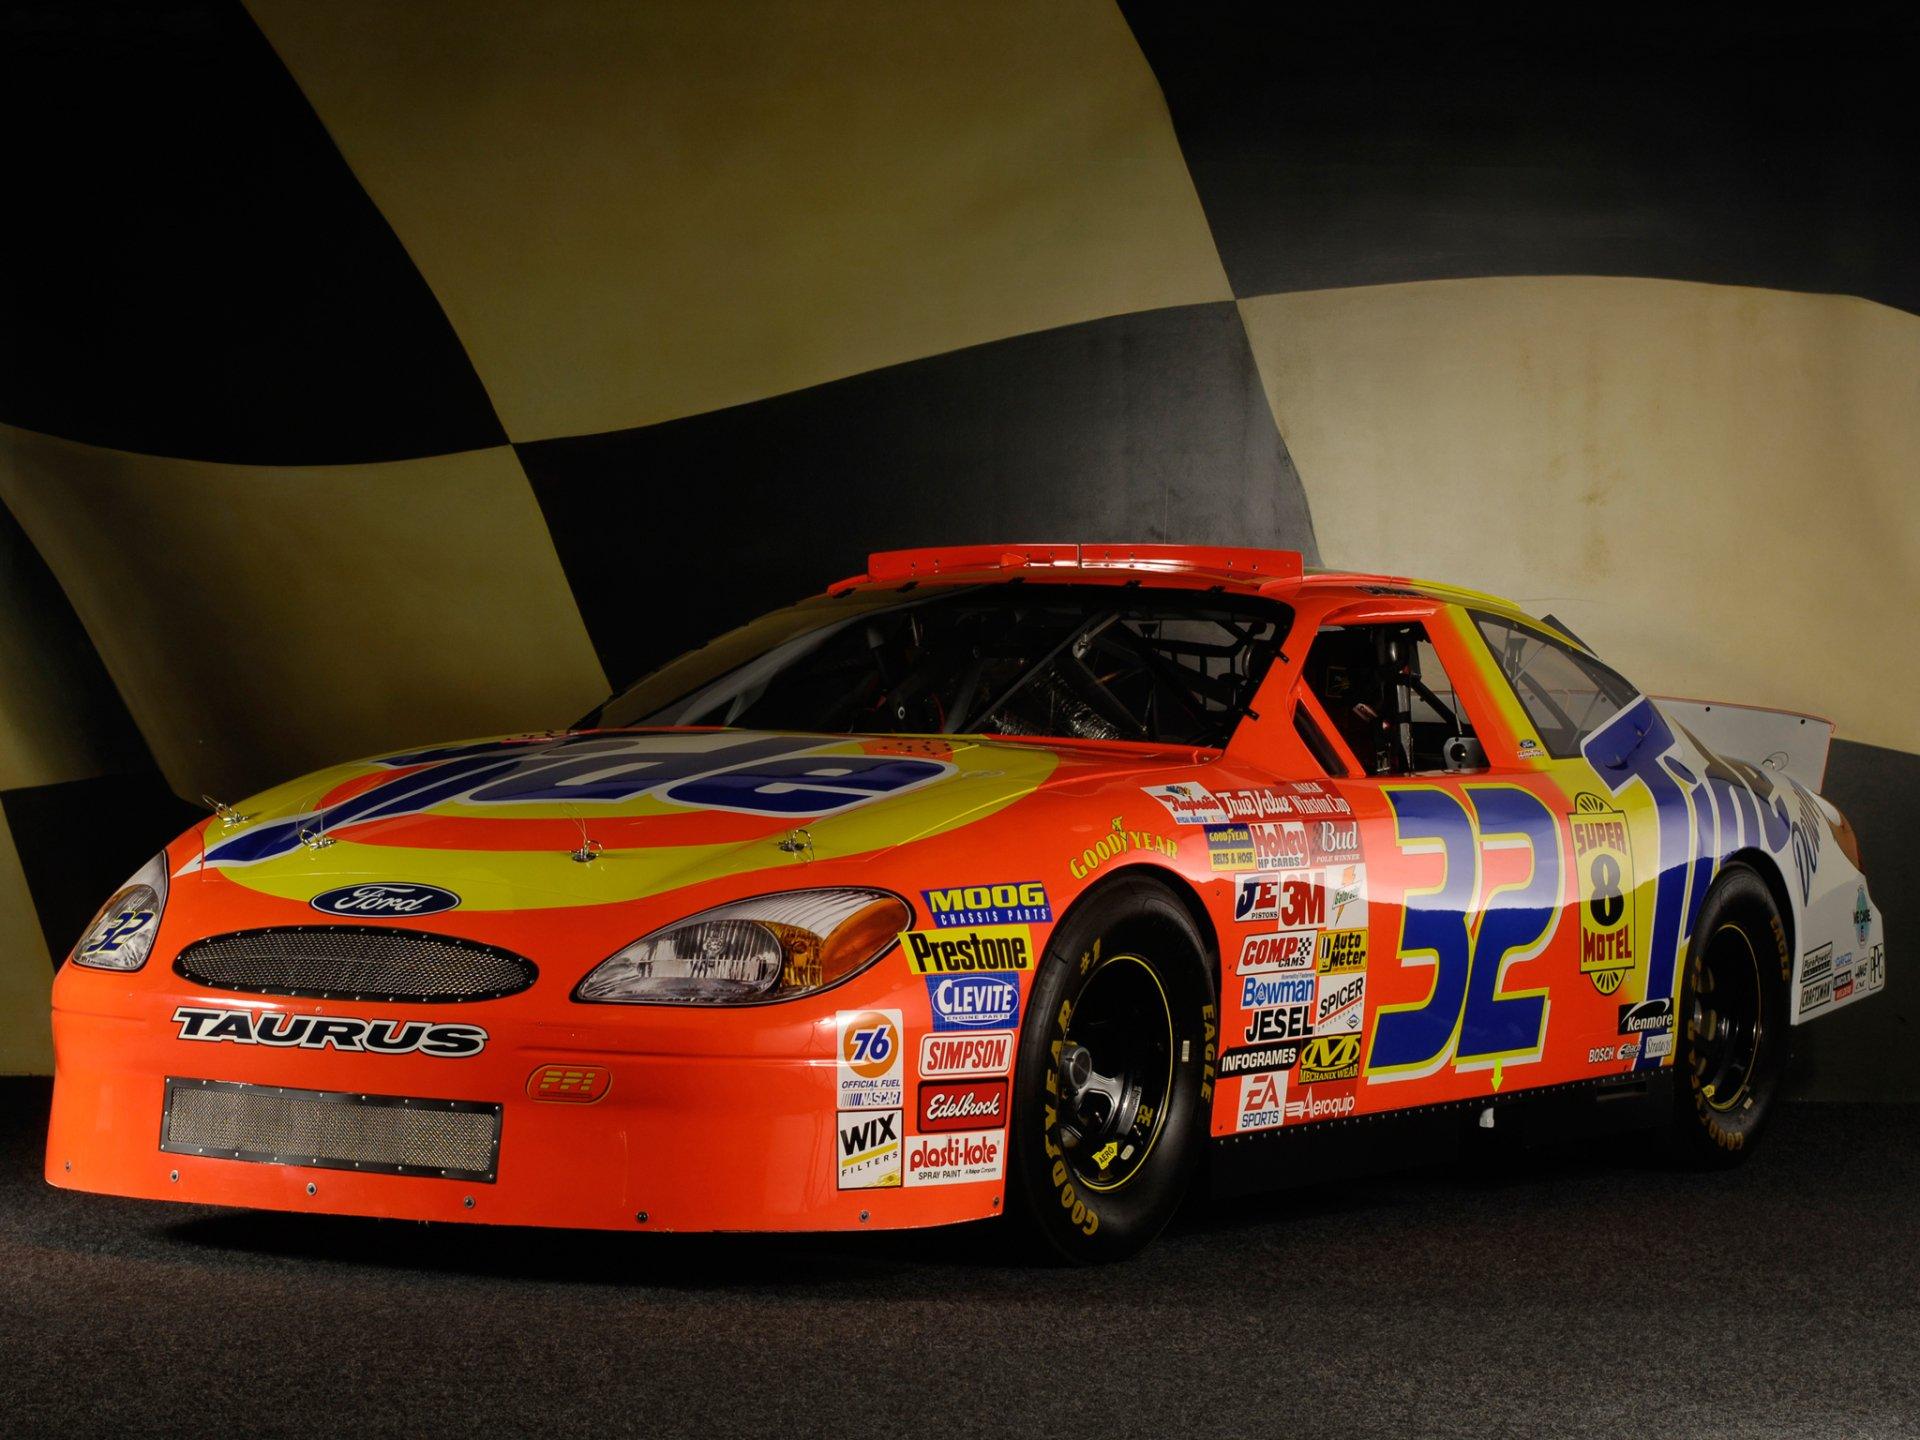 Ford taurus nascar race car 39 1999 hd wallpaper - Nascar wallpaper ...